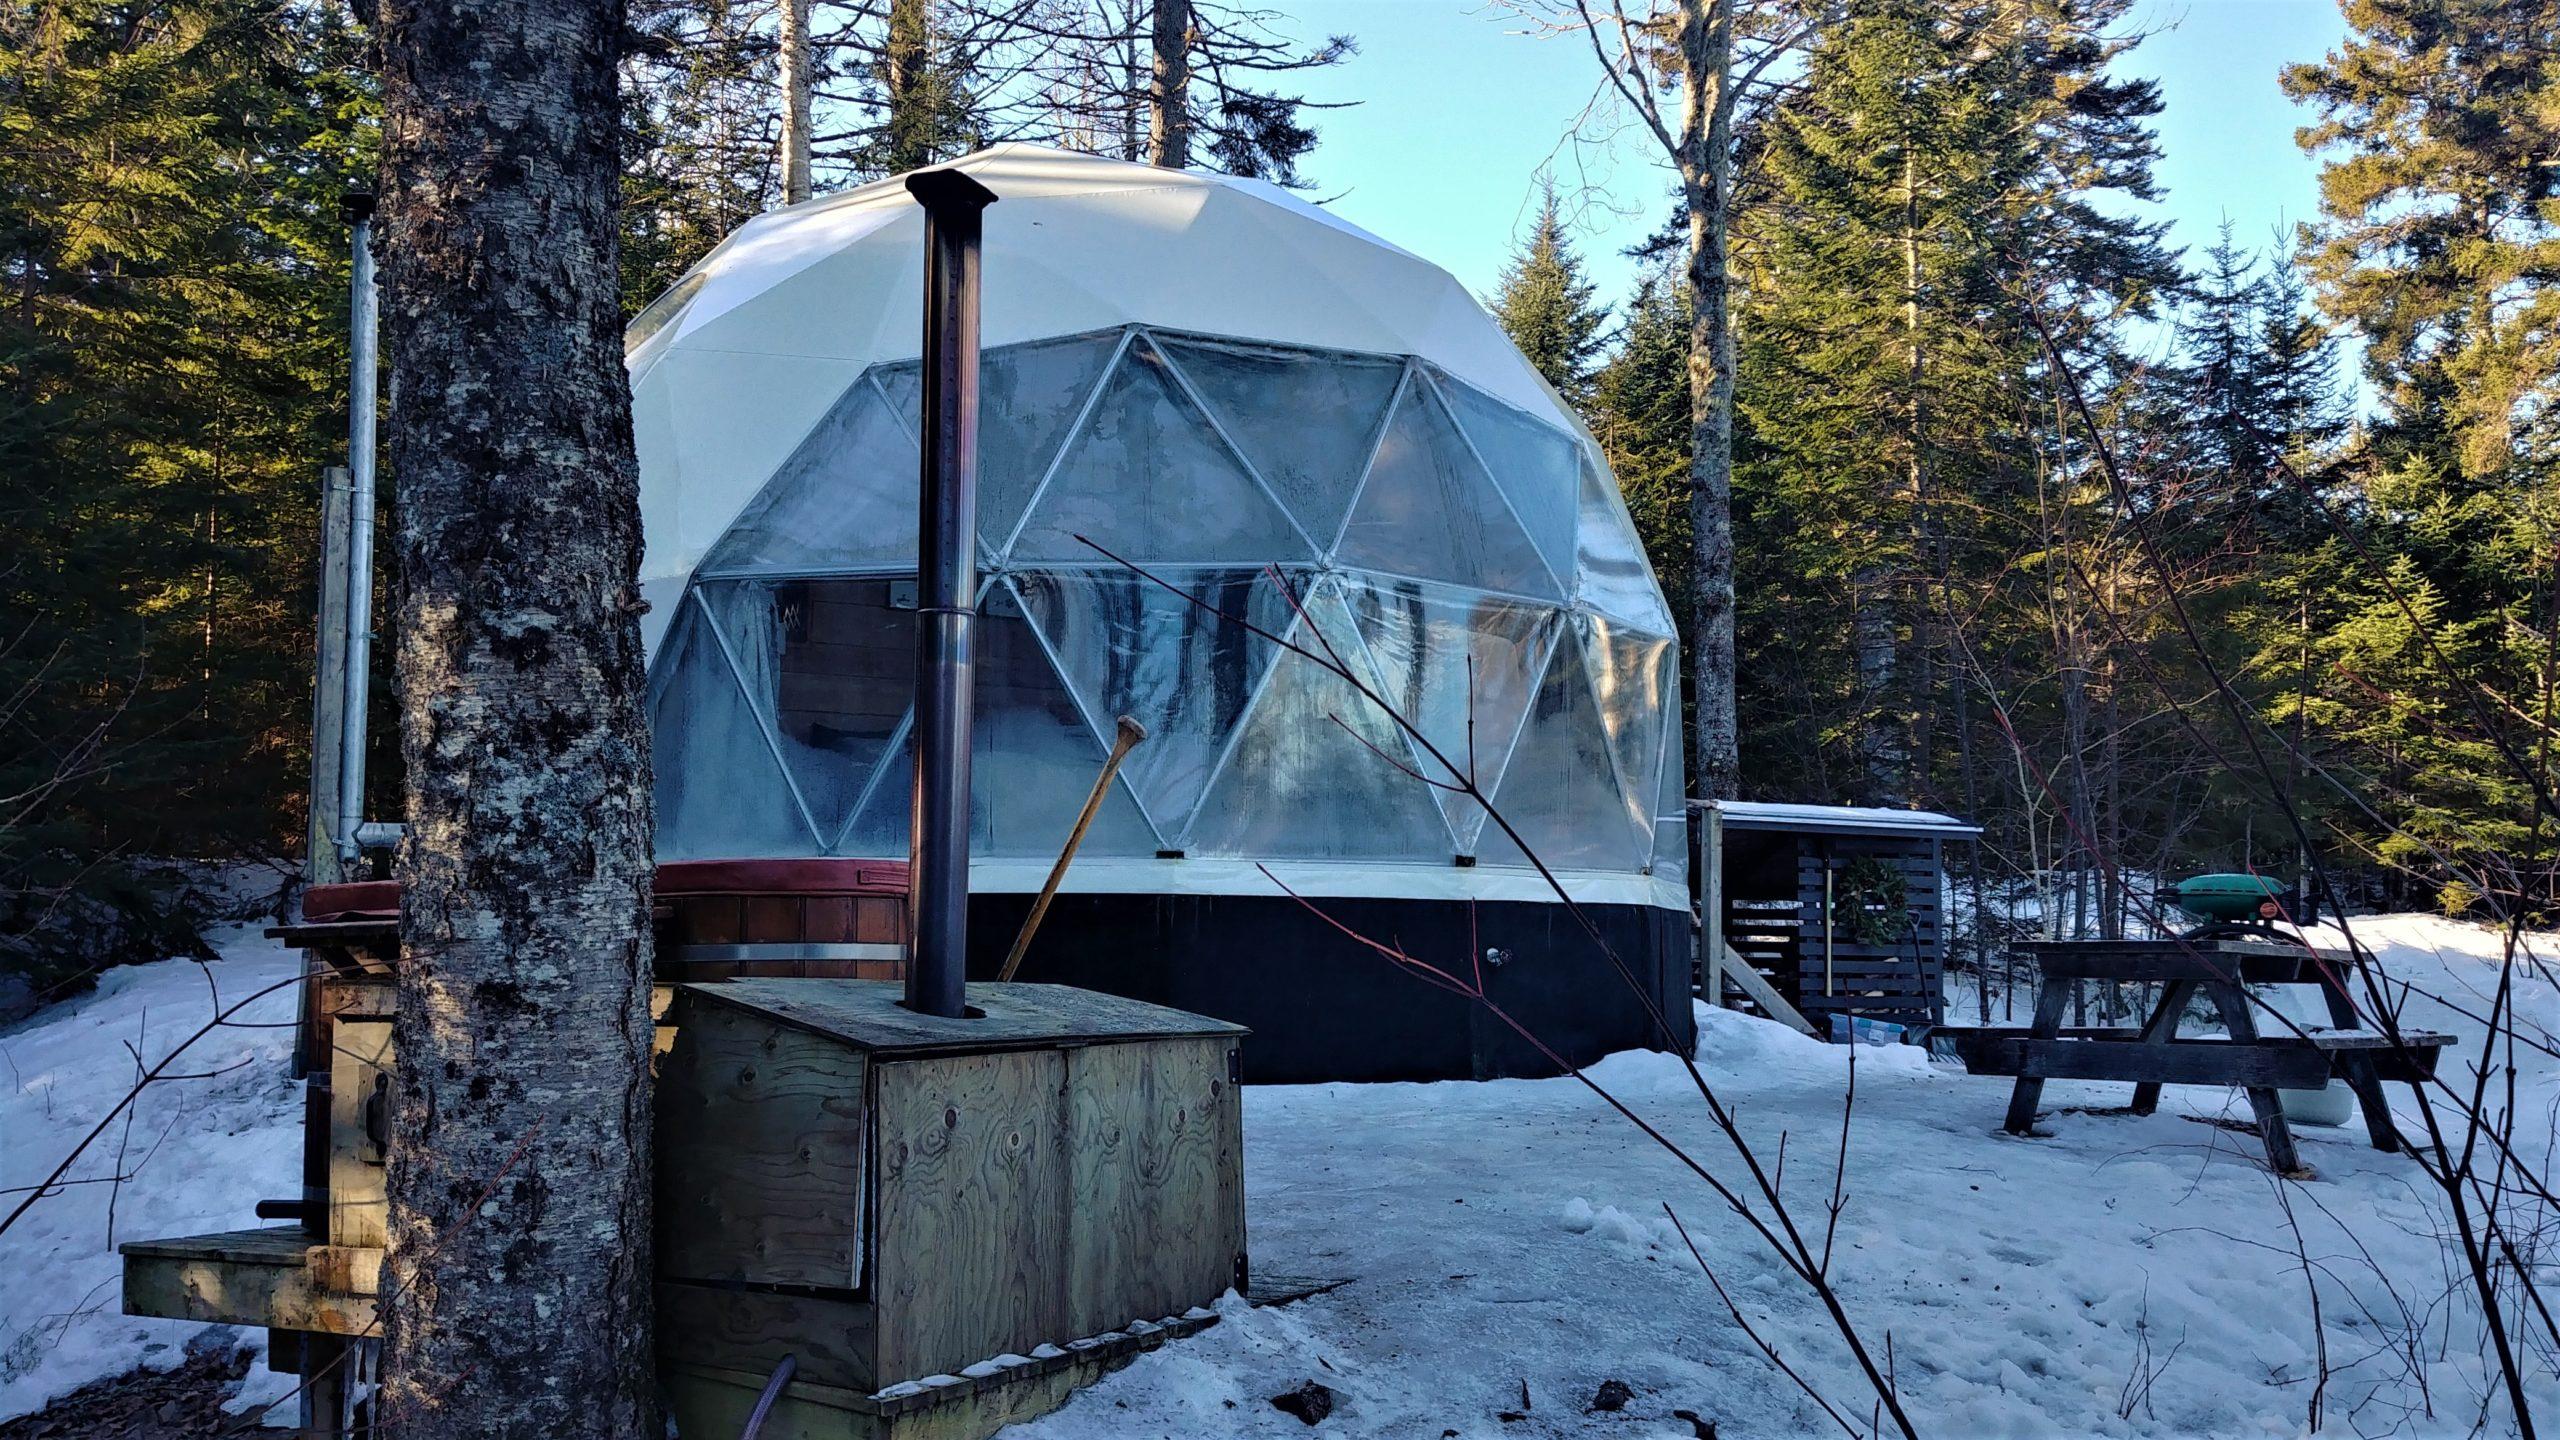 Ridgeback lodge hebergement insolite nouveau-brunswick blog voyage canada